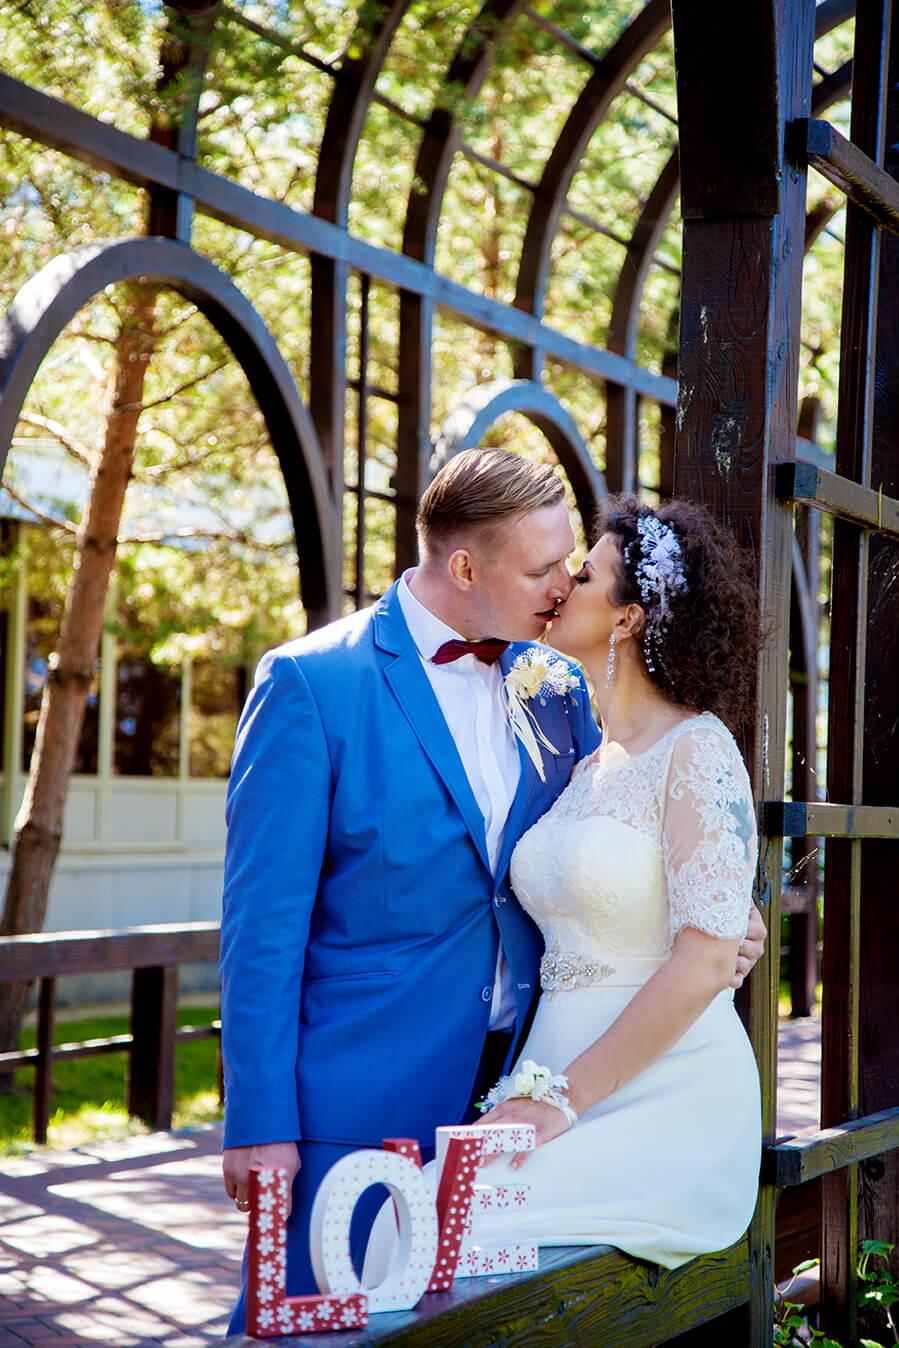 3-svadebnyj-fotograf-videooperator-svadebnoe-foto-idei-kiev-45